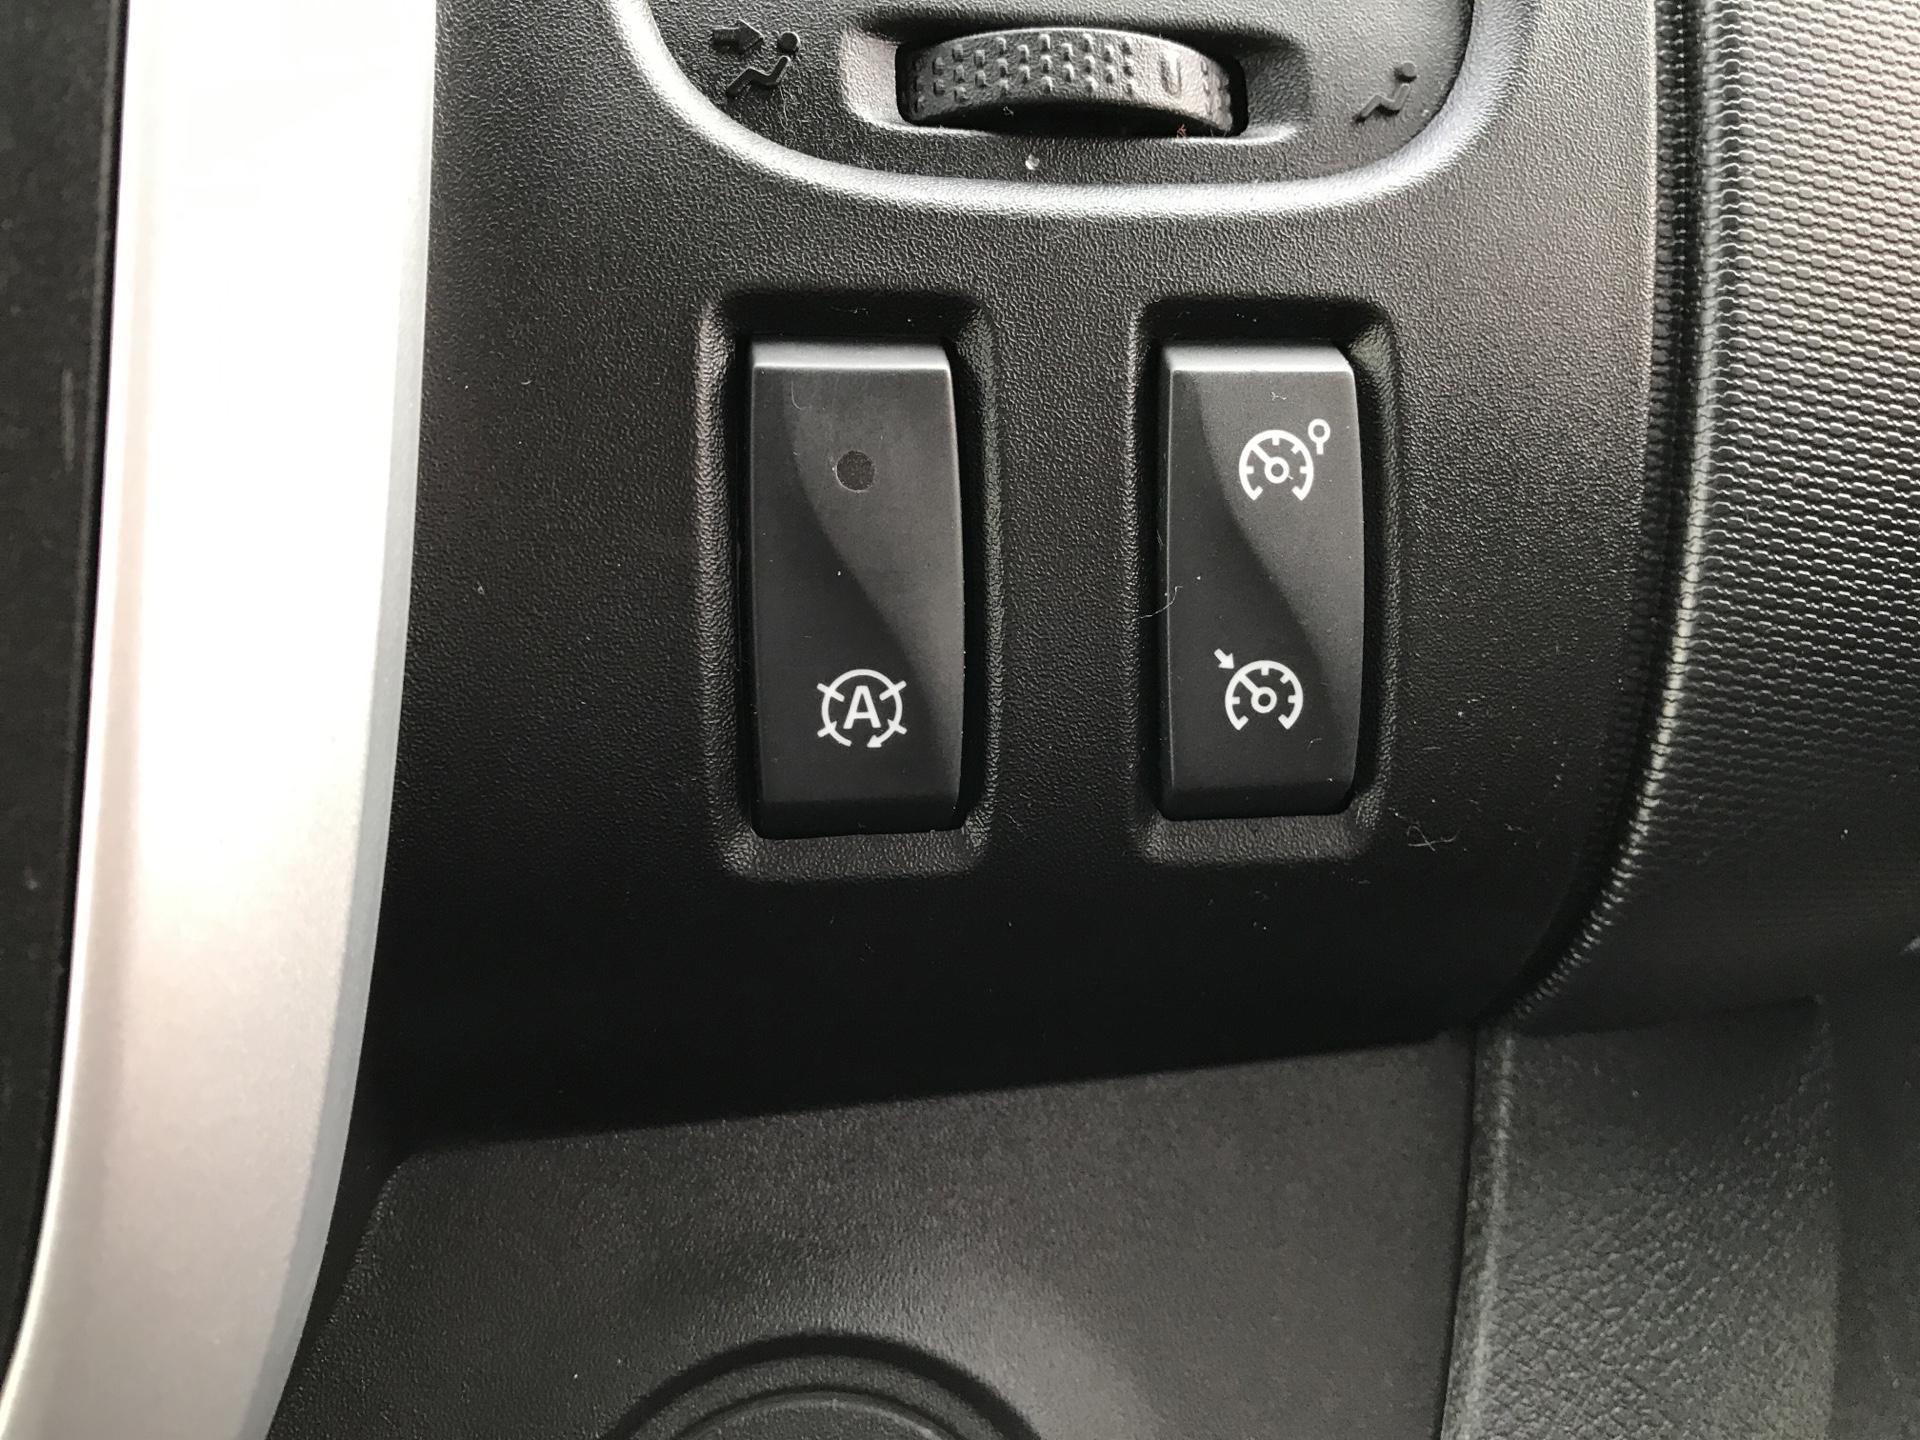 2015 Vauxhall Vivaro L1 H1 2700 1.6 BITURBO 120PS ECOFLEX SPORTIVE EURO 5 (DP15LGO) Image 22